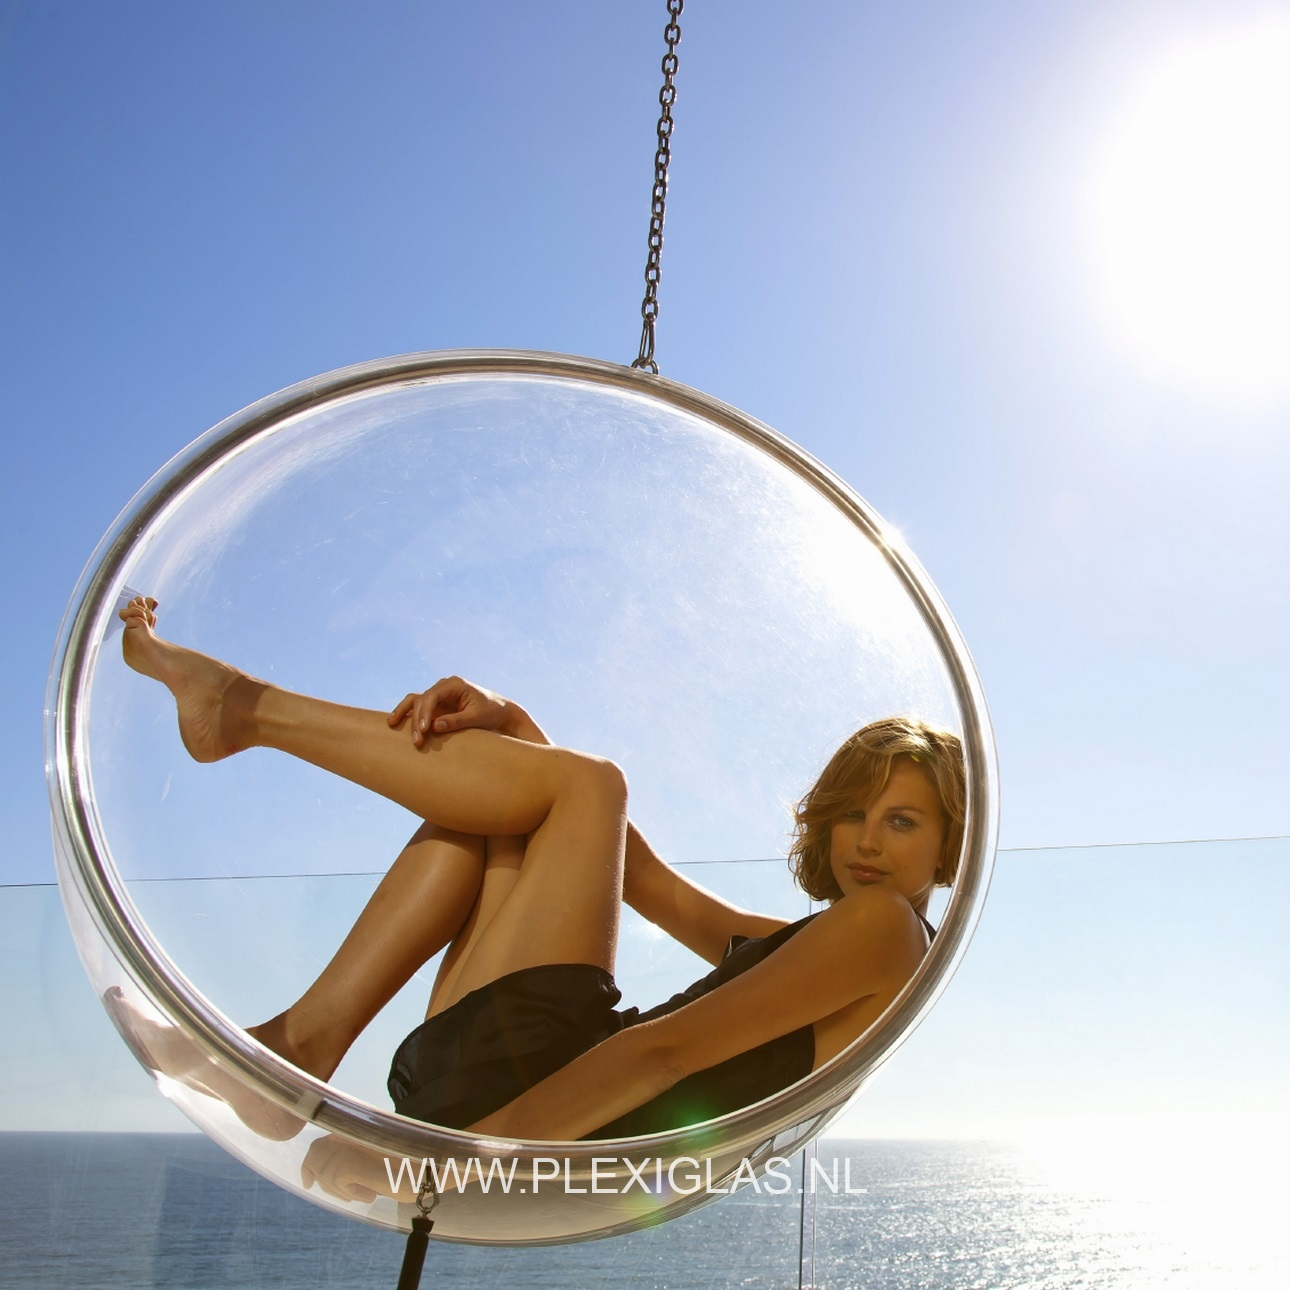 plexiglas hangstoel